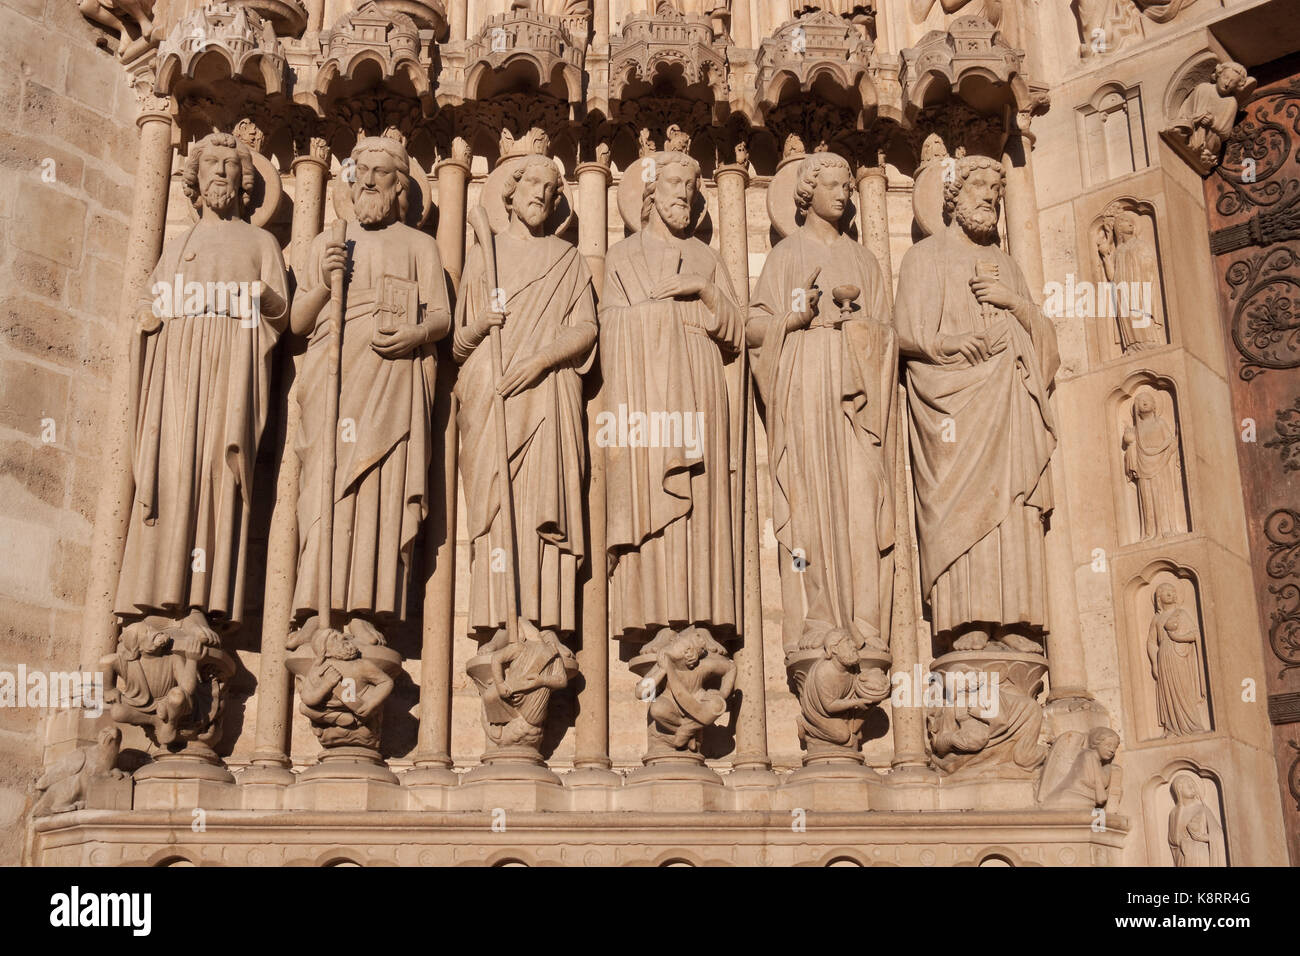 Statues of apostles on the the Portal of the Last Judgement, Notre dame de Paris Stock Photo